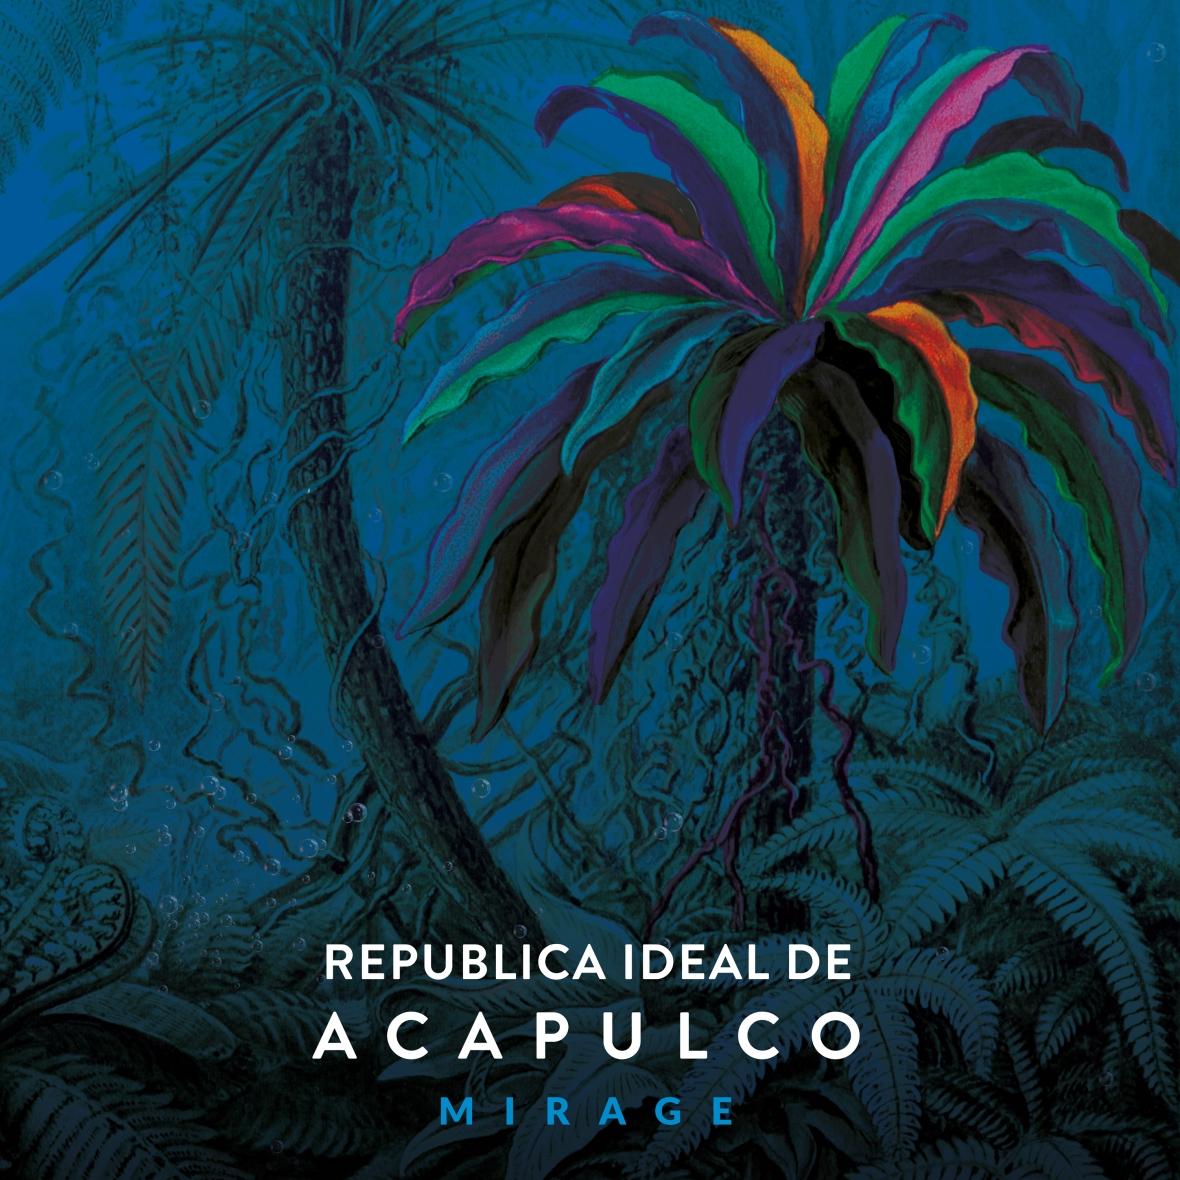 Republica Ideal de Acapulco - Mirage